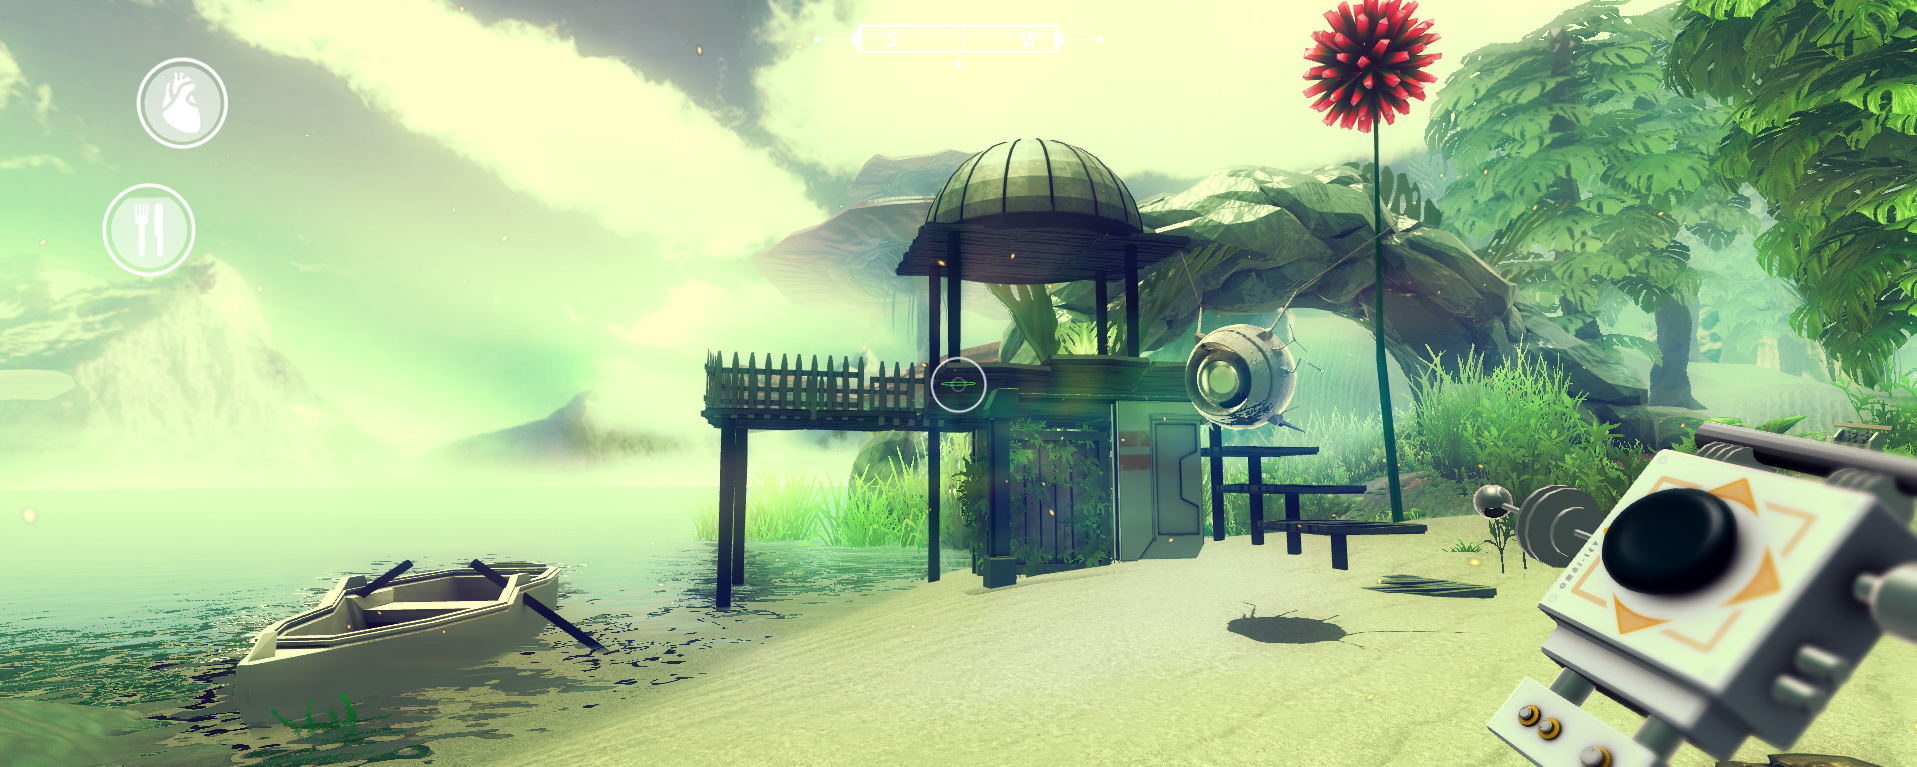 Hastily made beach hut